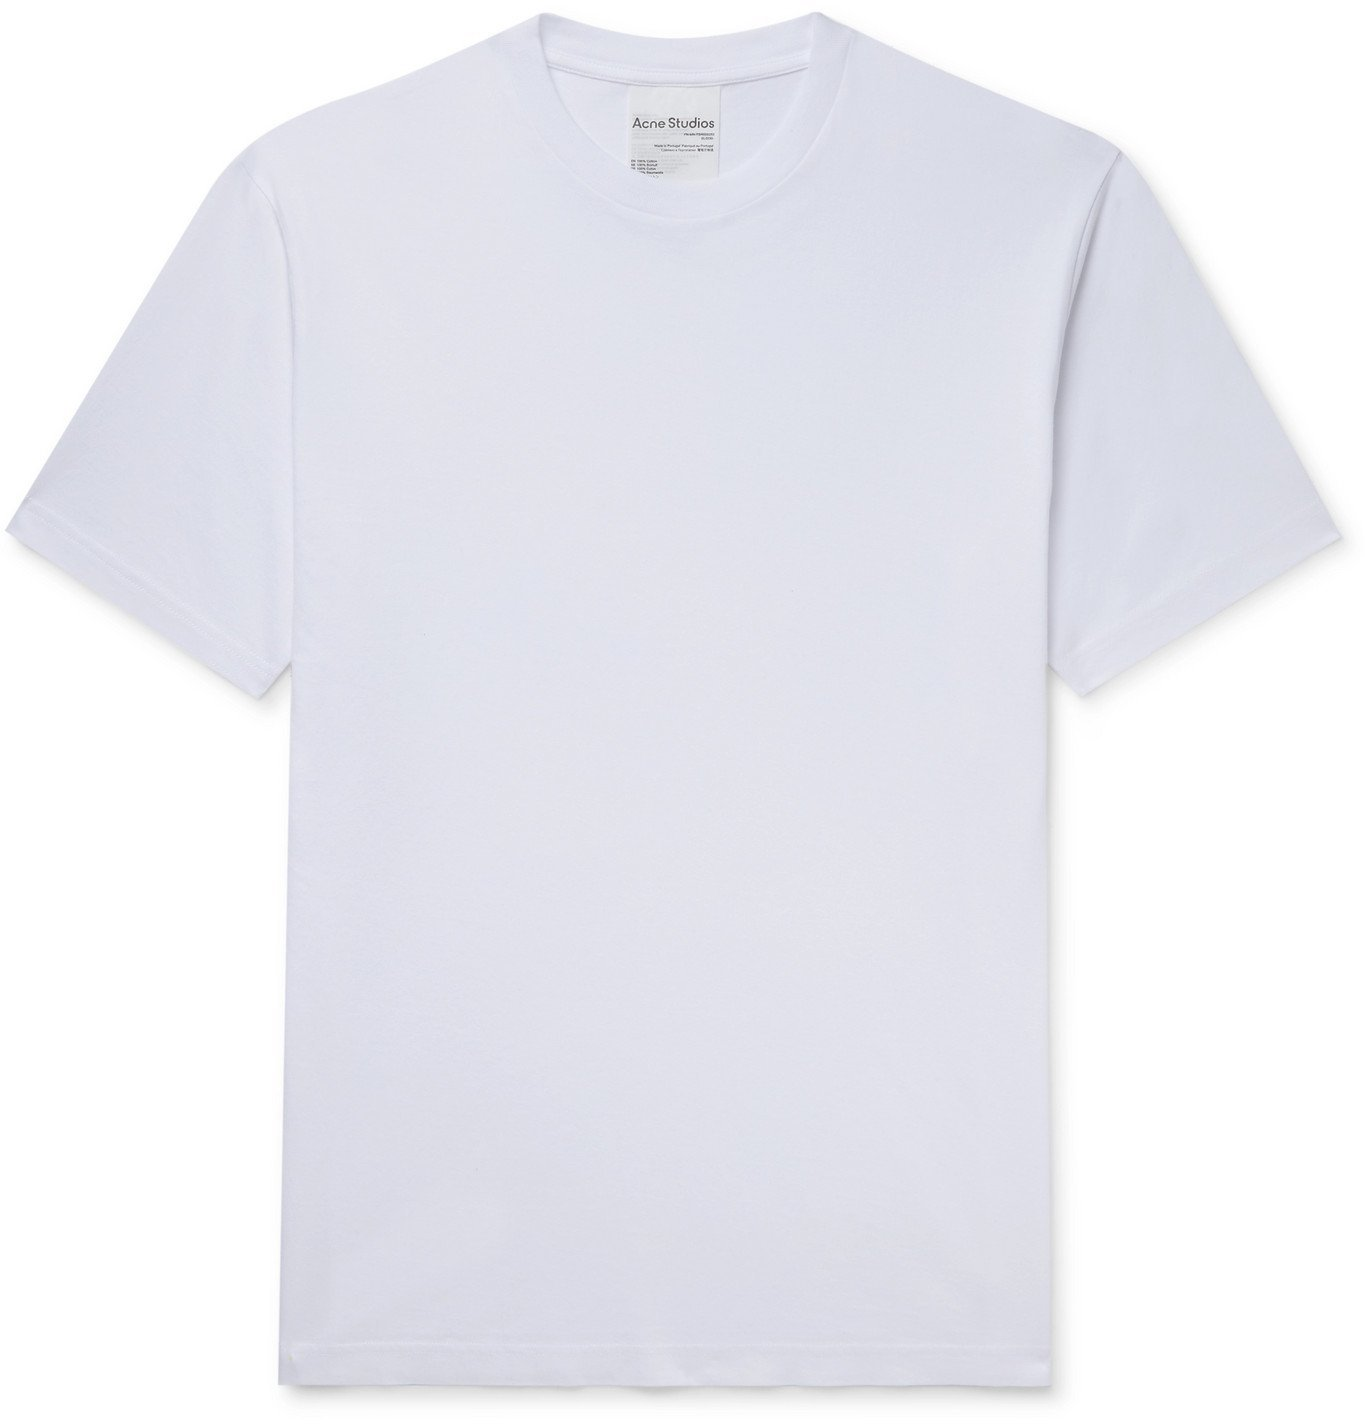 ACNE STUDIOS - Everrick Slim-Fit Cotton-Jersey T-Shirt - White